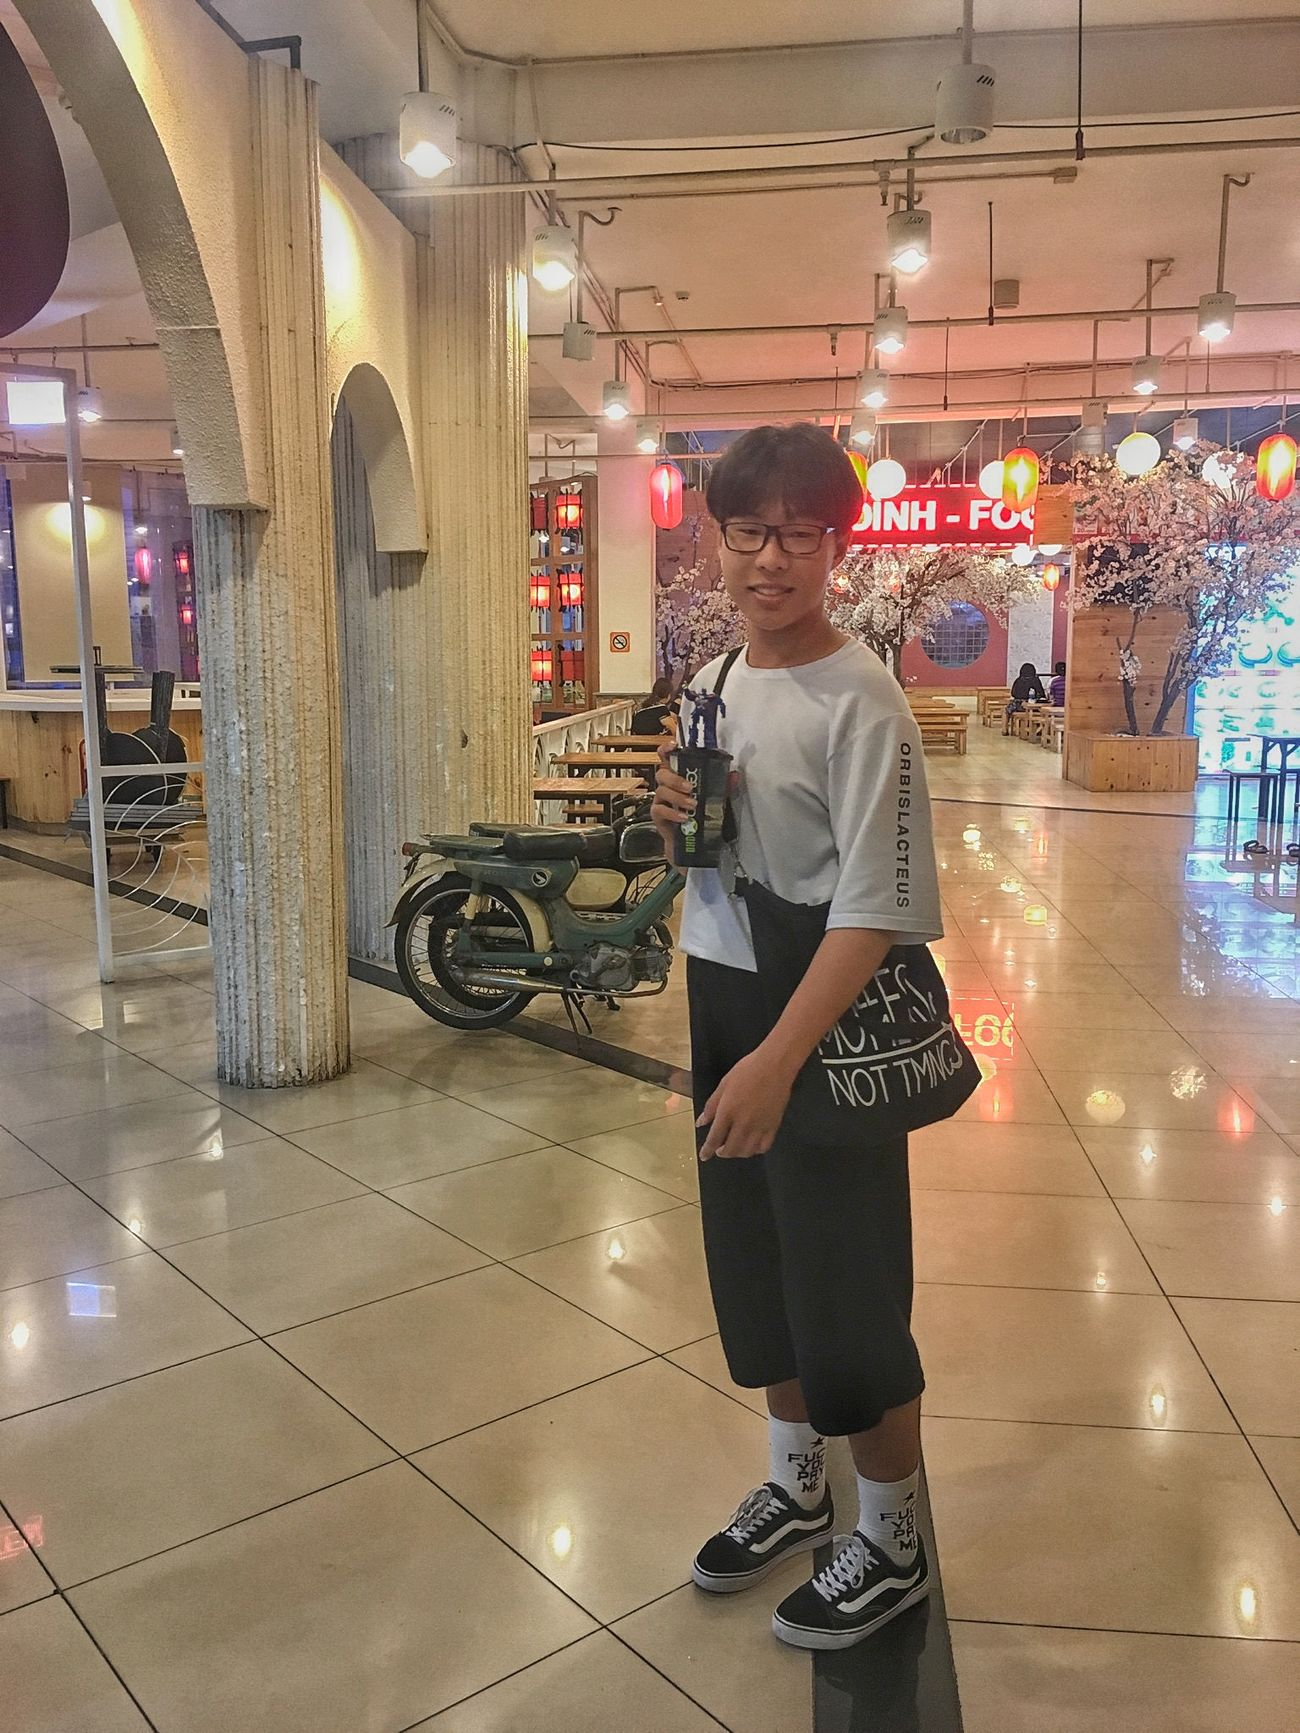 Me, 1m75. Model 16th Me Nguyenhungtien Love ♥ Vietnam Day Alone